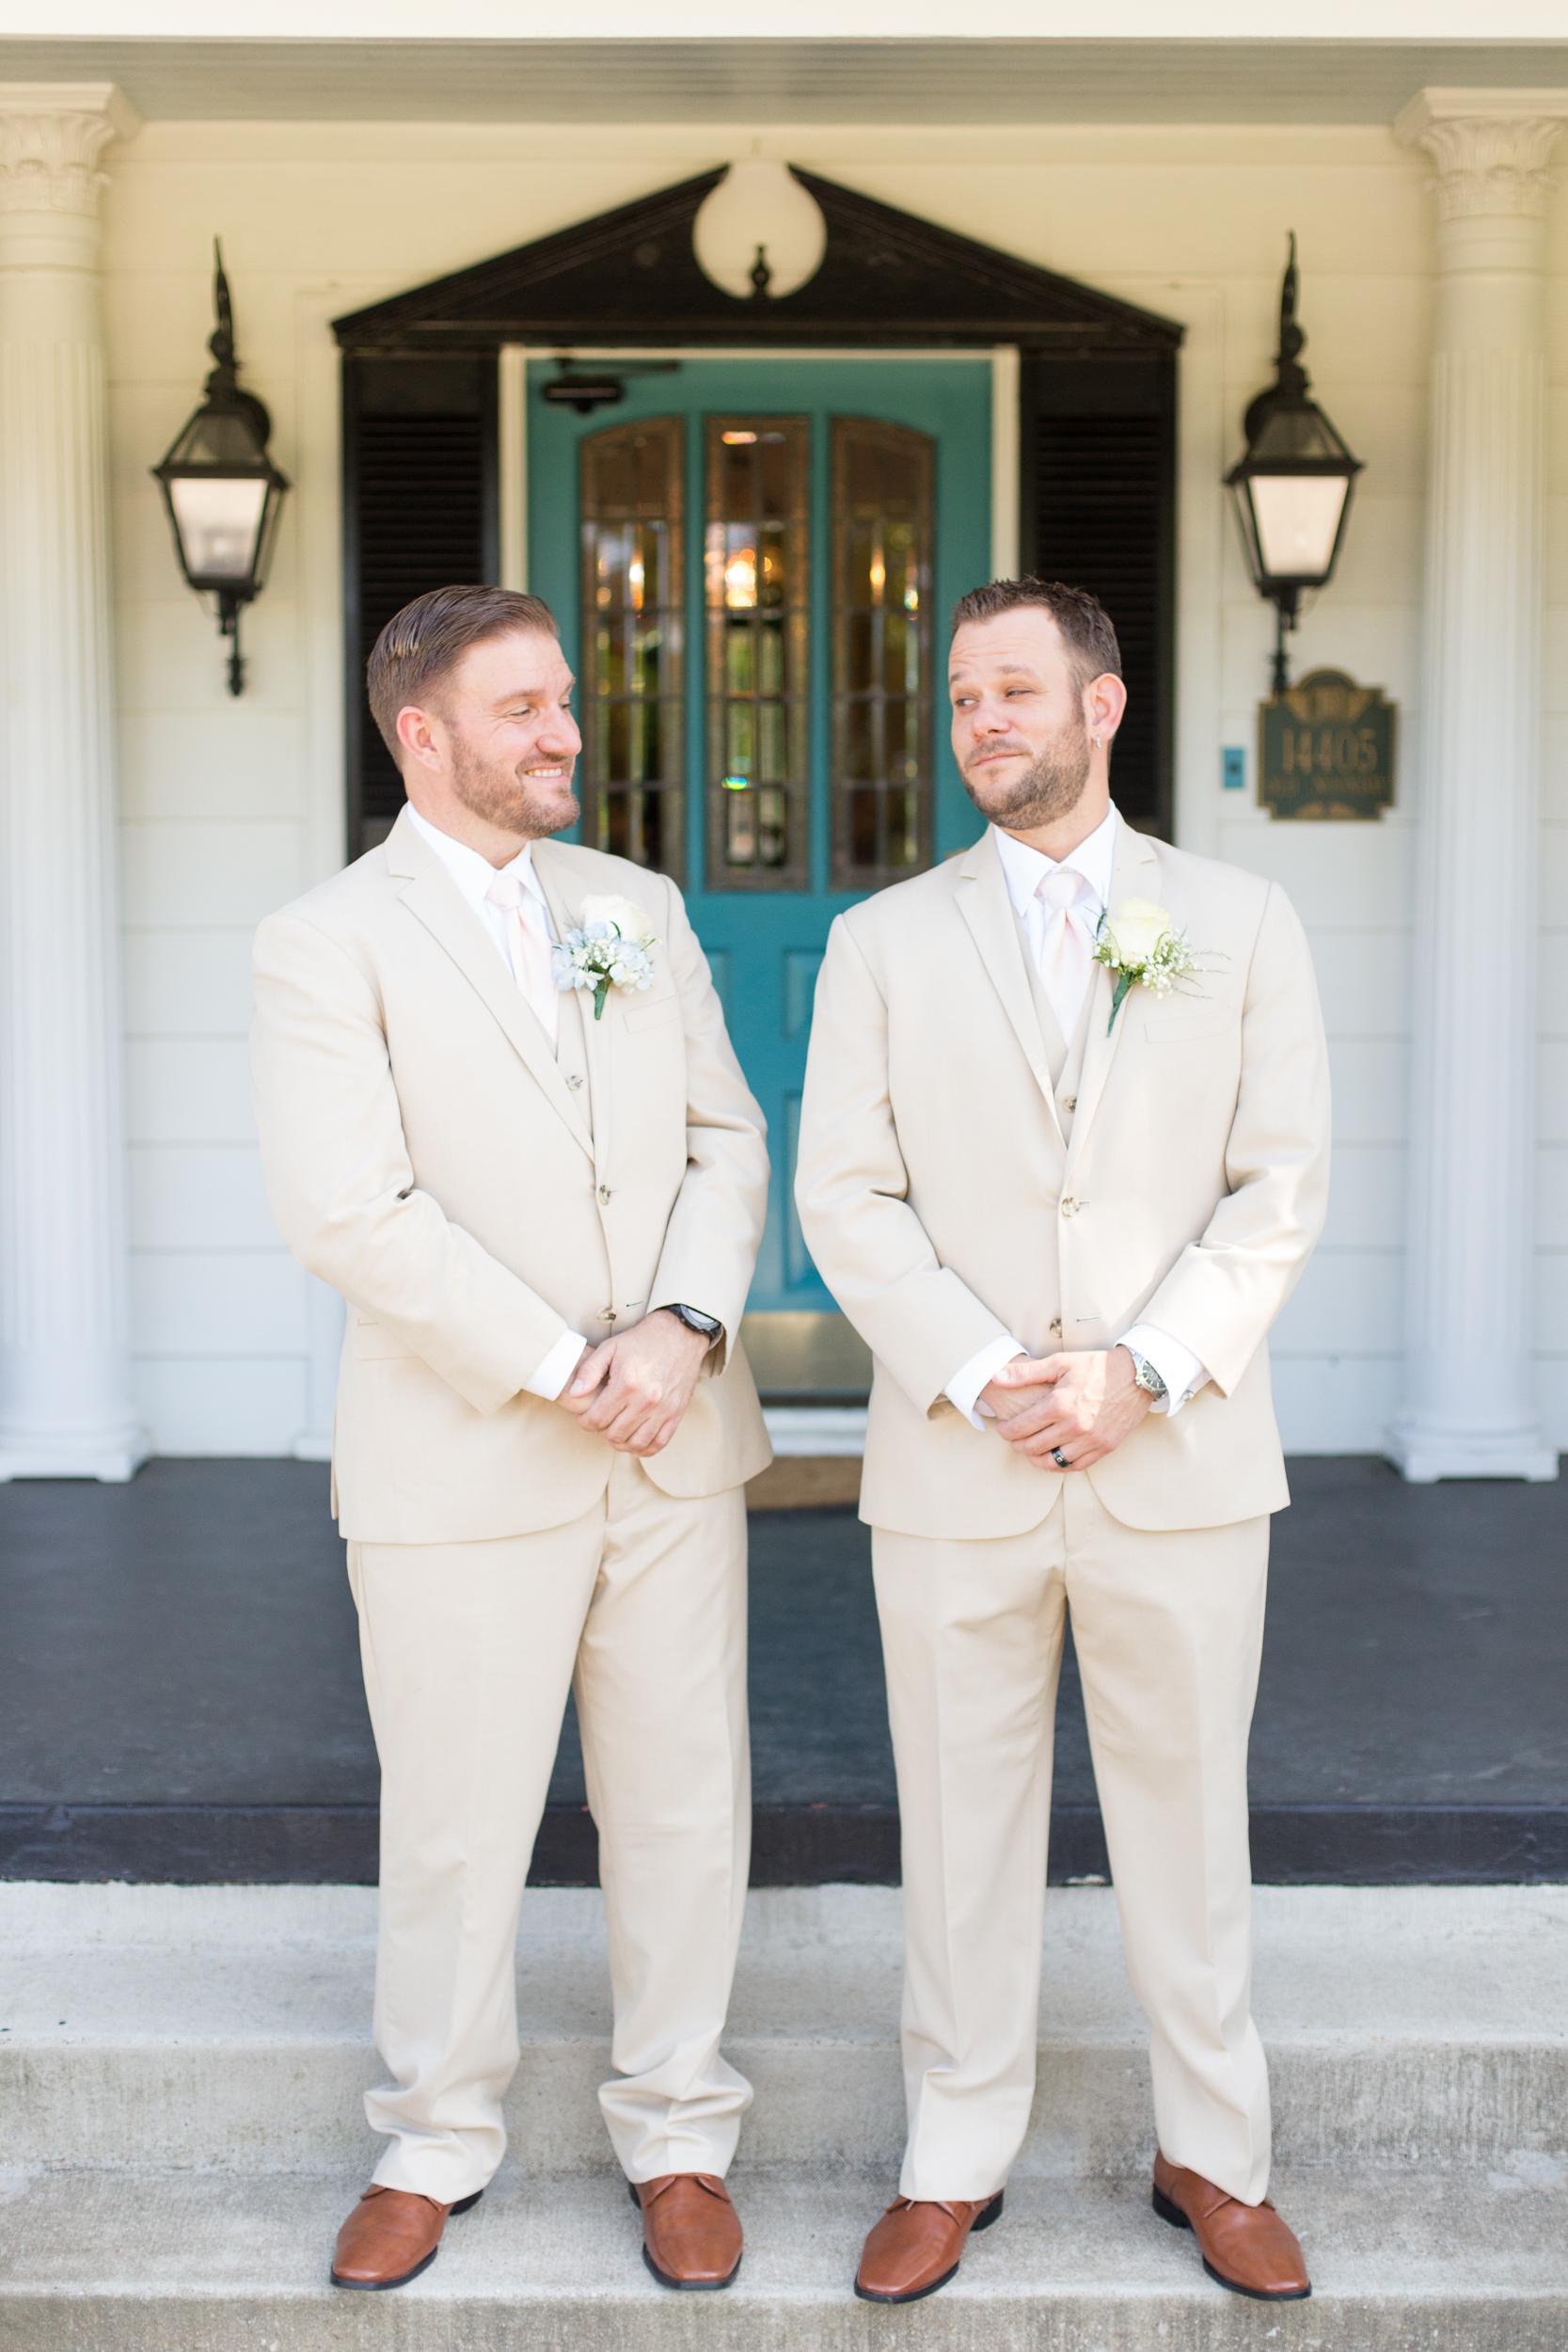 Zihlman-East TX Wedding_Kelsie Hendricks Photography_The Folmar Tyler Texas-88.jpg